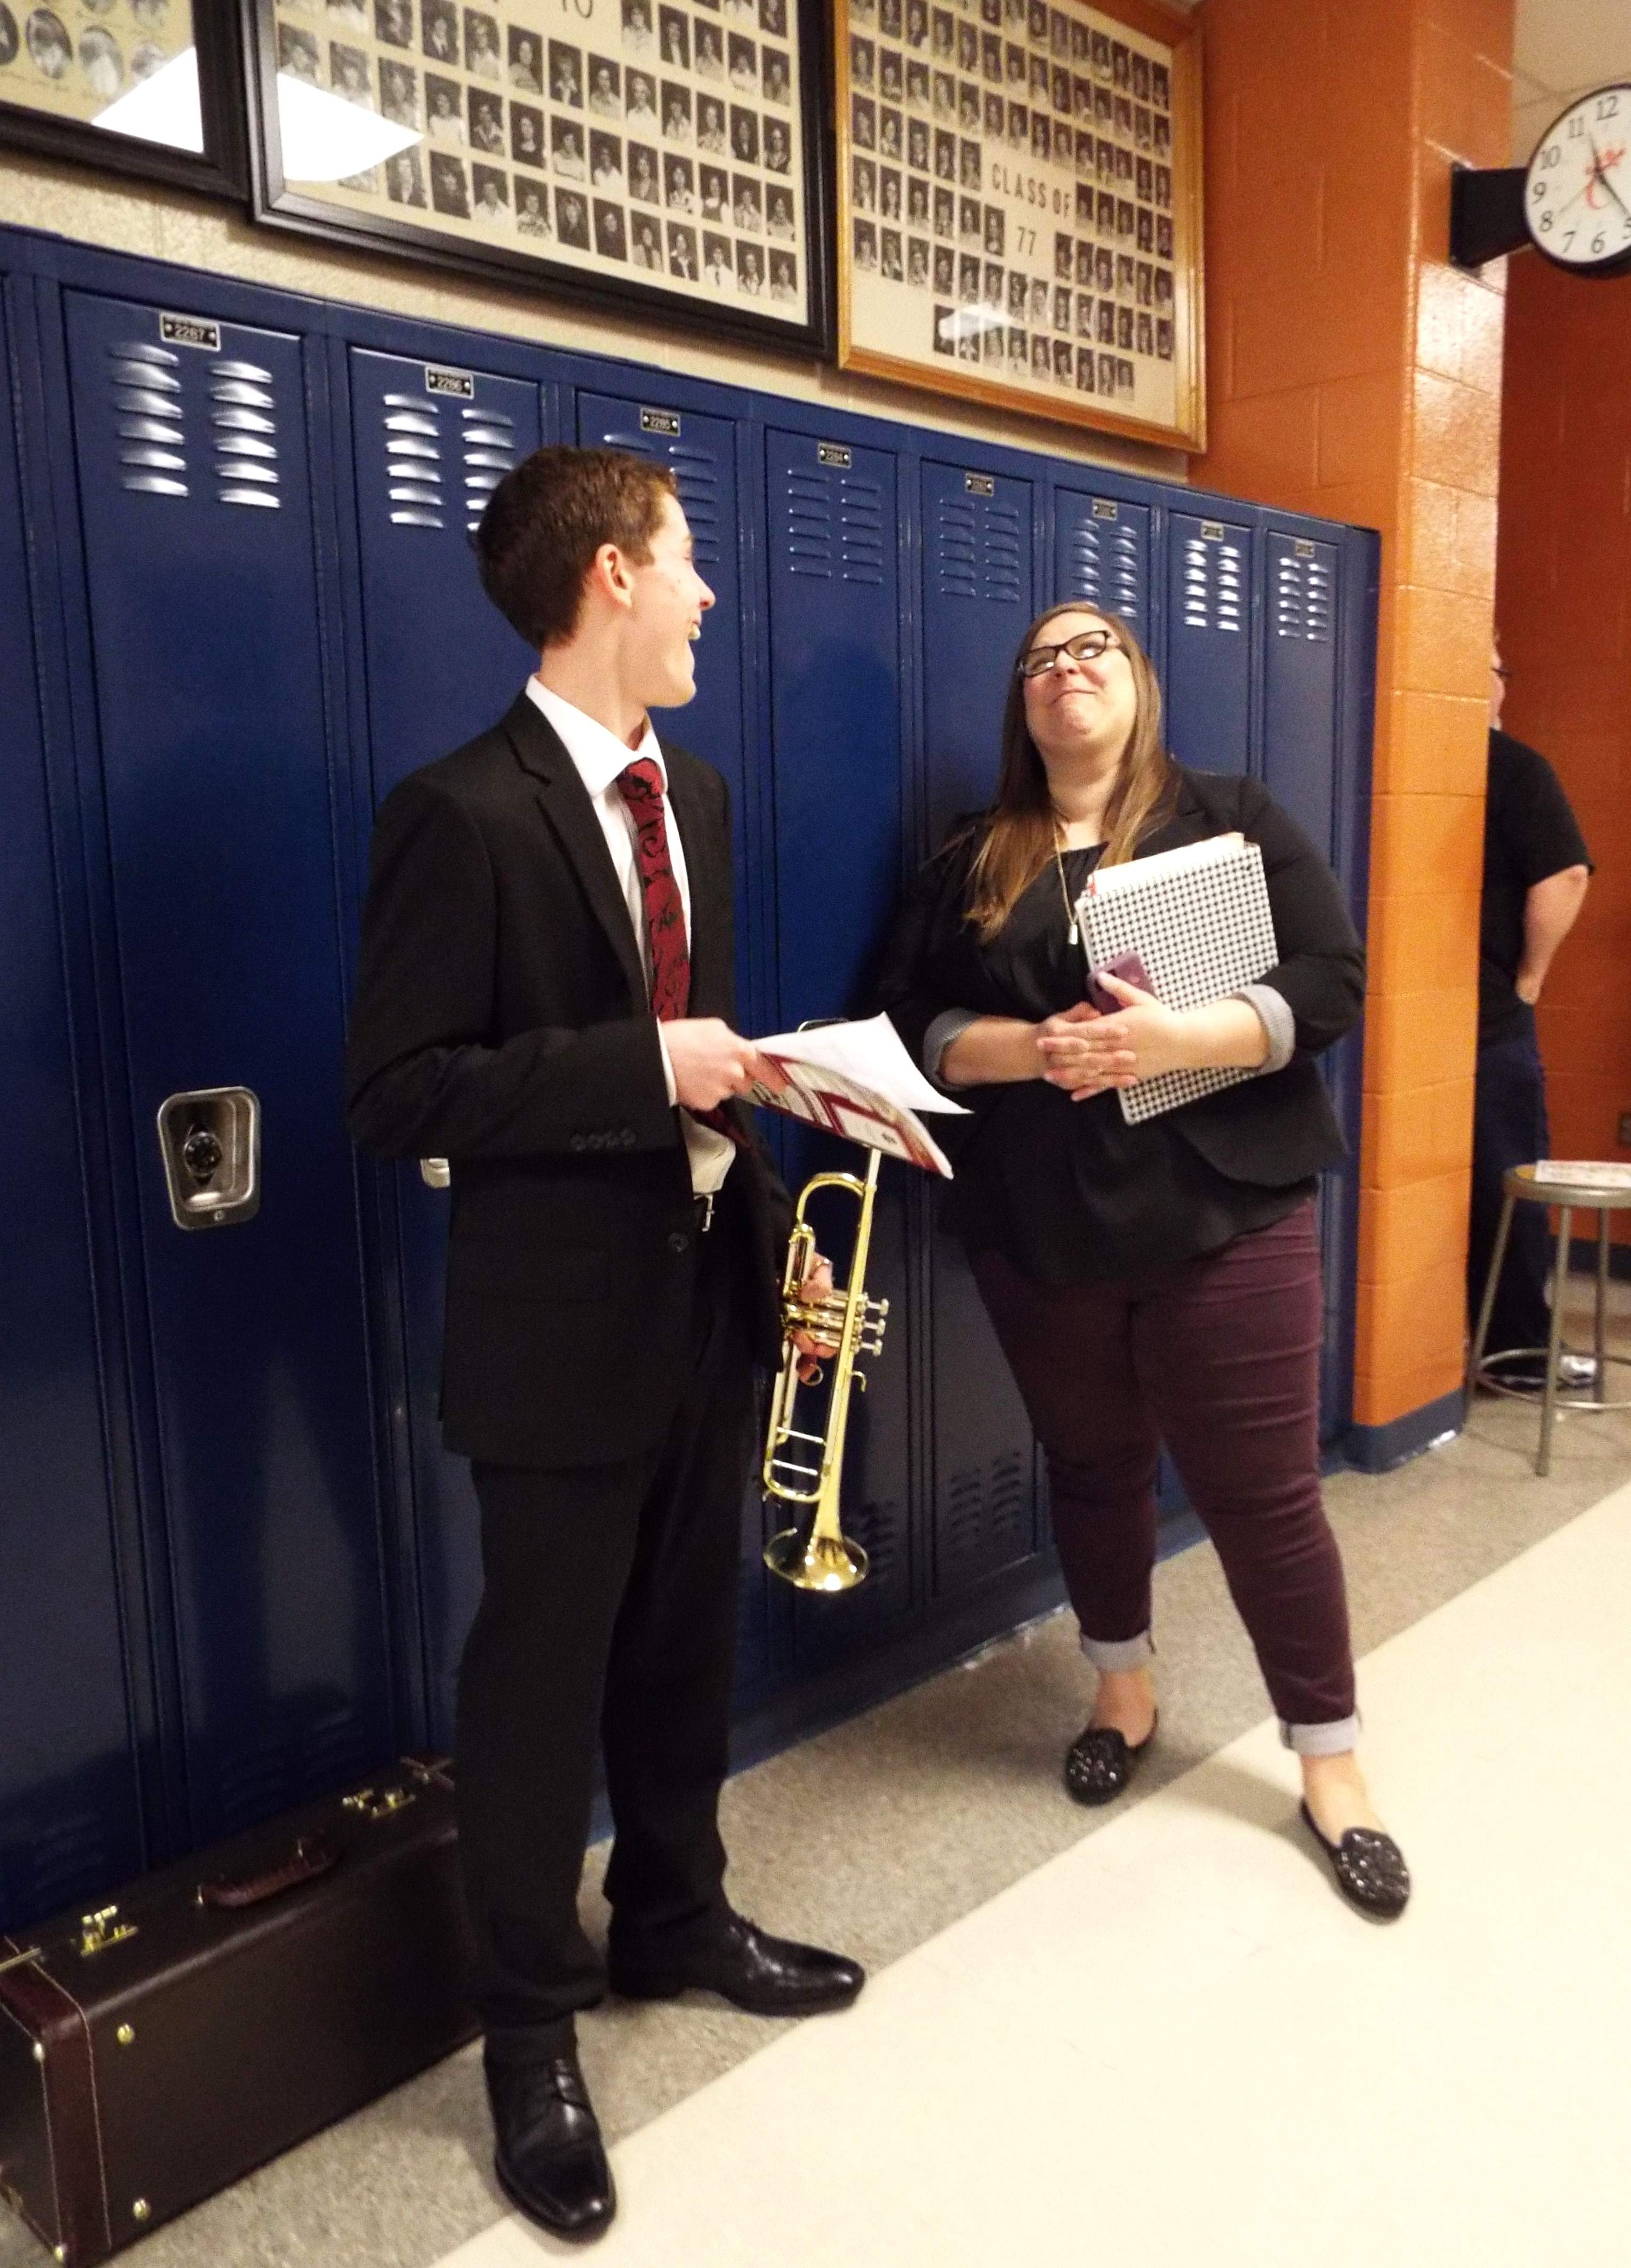 Landon Gates gets some last-minute encouragement from Harrisburg High School Band Director Hannah Drake.